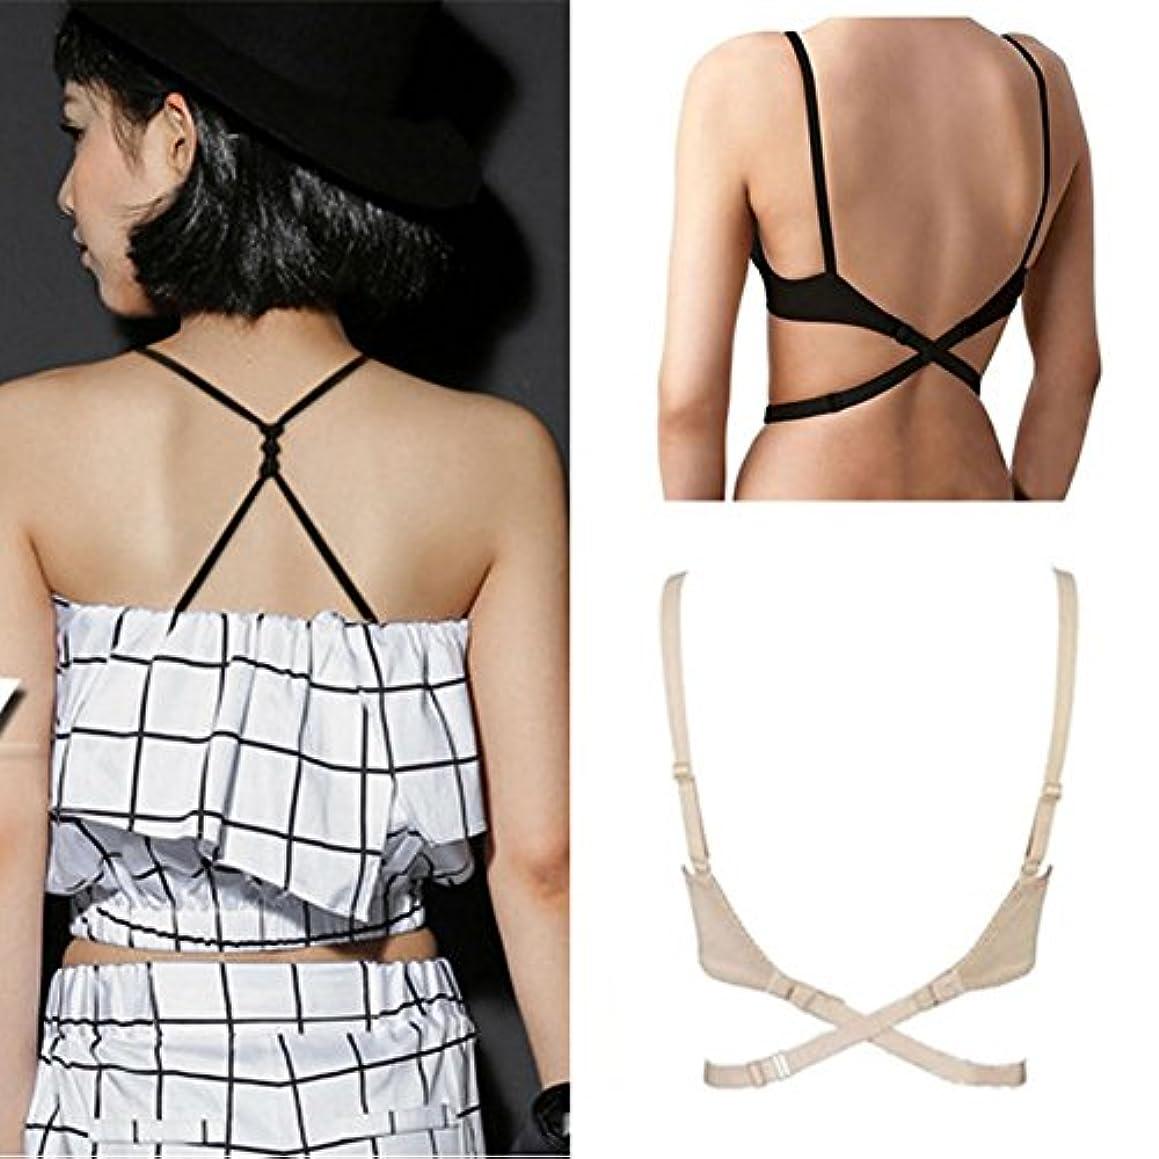 AKOAK 3 Pieces Per Pack Fashion Women Adjustable Backless Bra Straps Converter Low Back Shoulder Strap Extender Bra Belt Extender Extension Straps